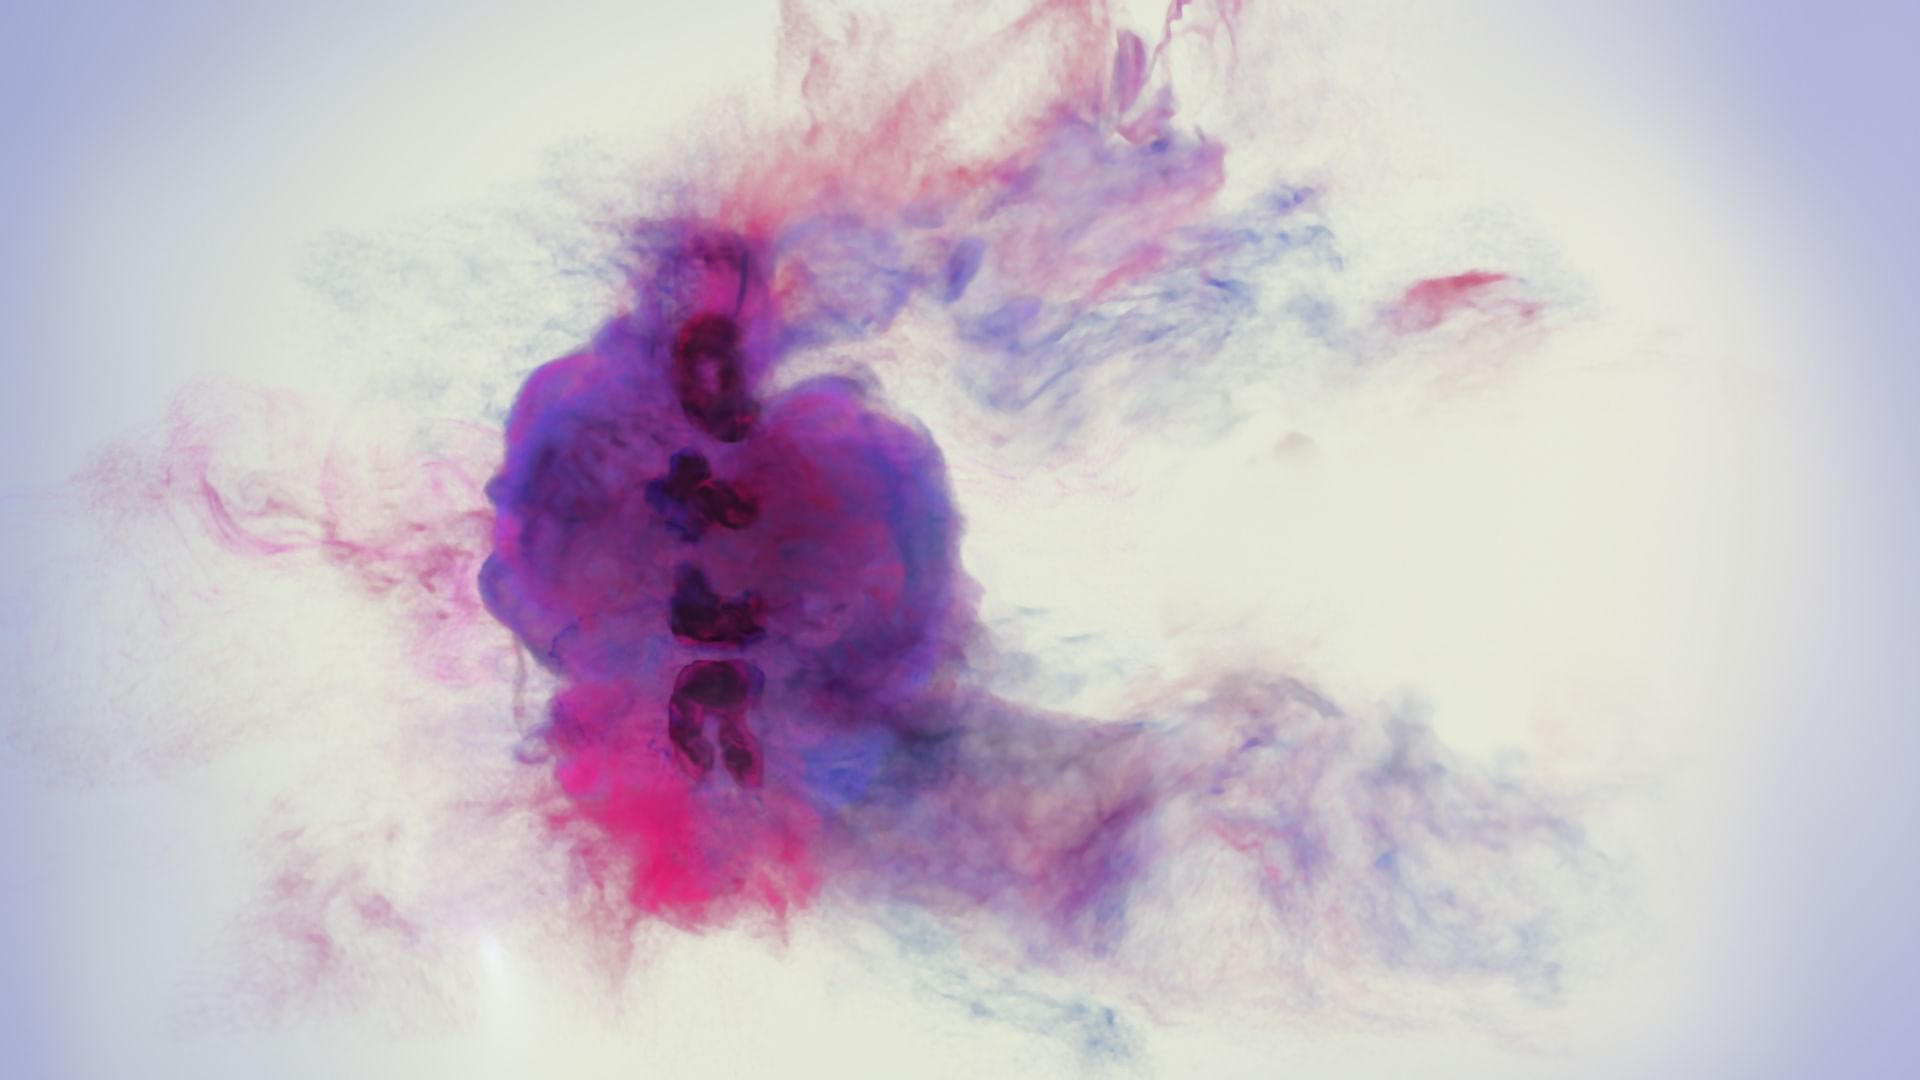 Turkey, Crossroads of the World